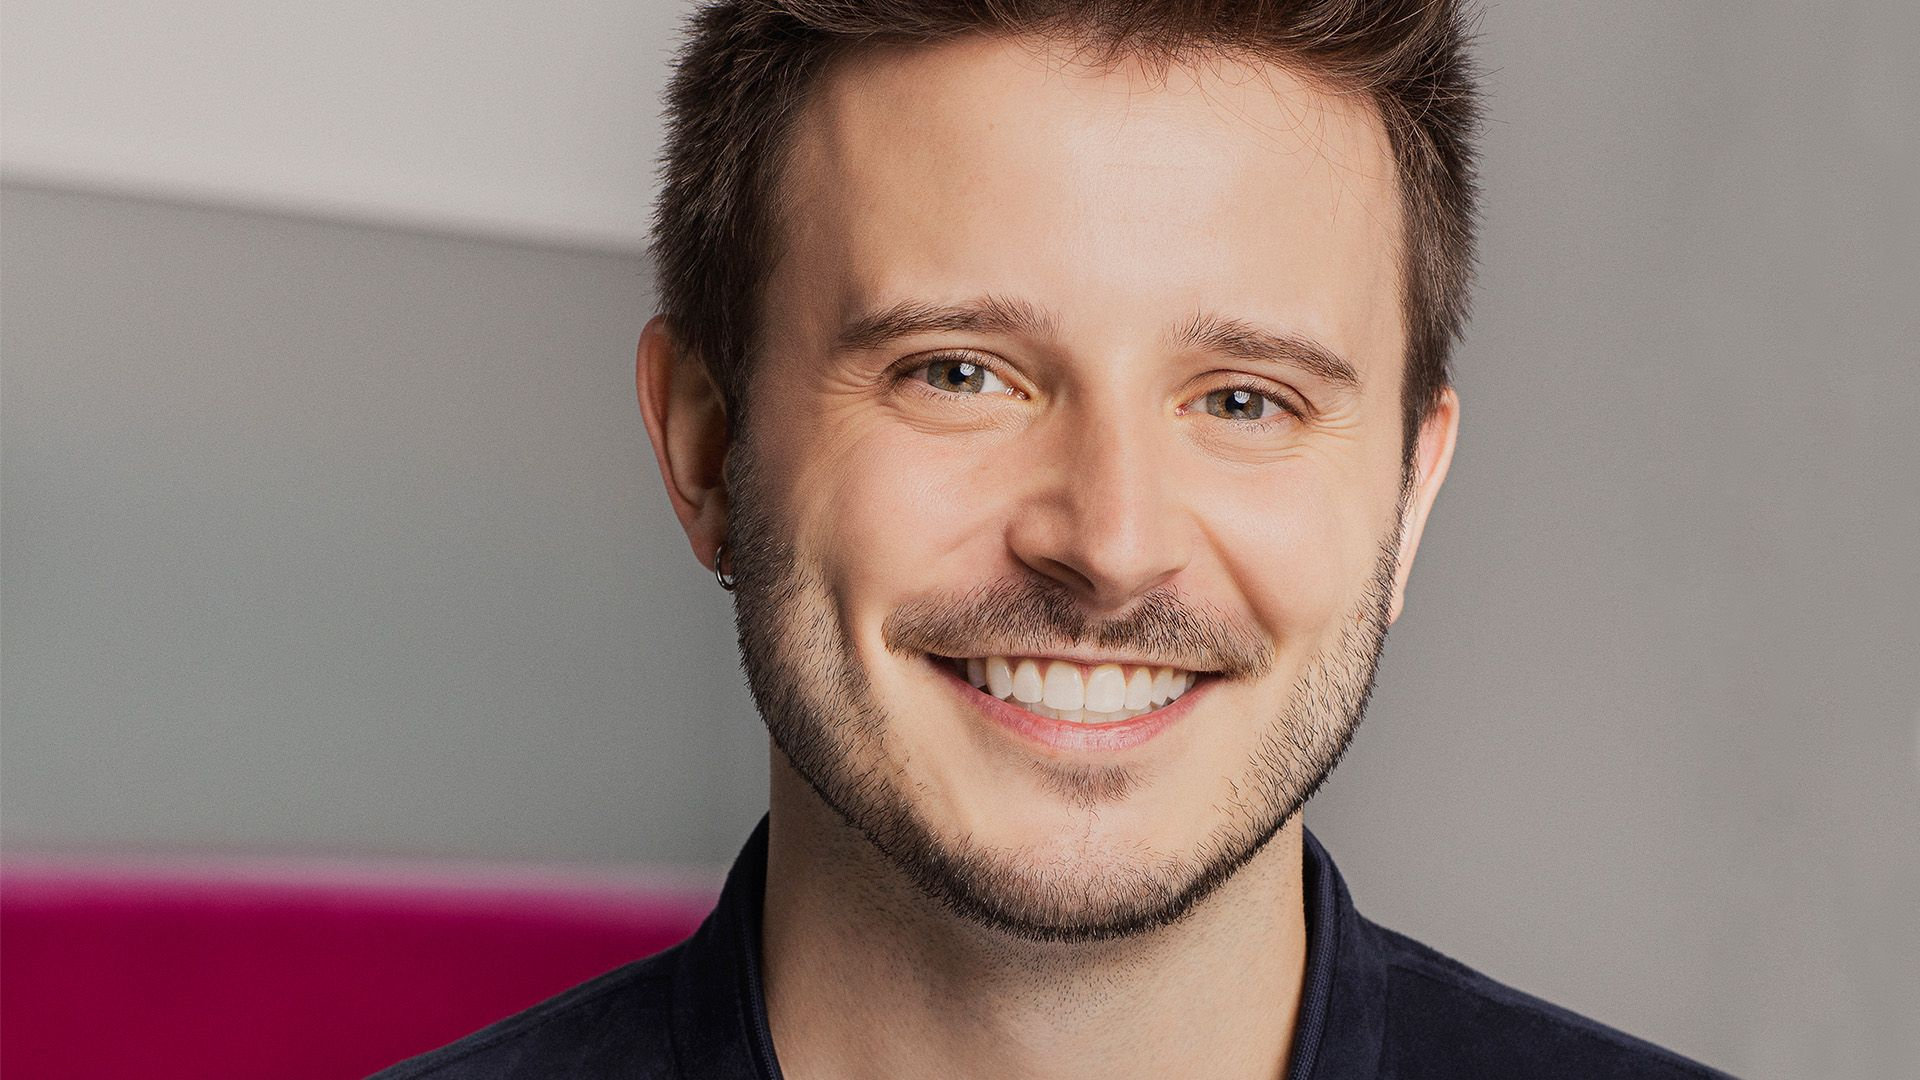 Renaud, donor since 2015